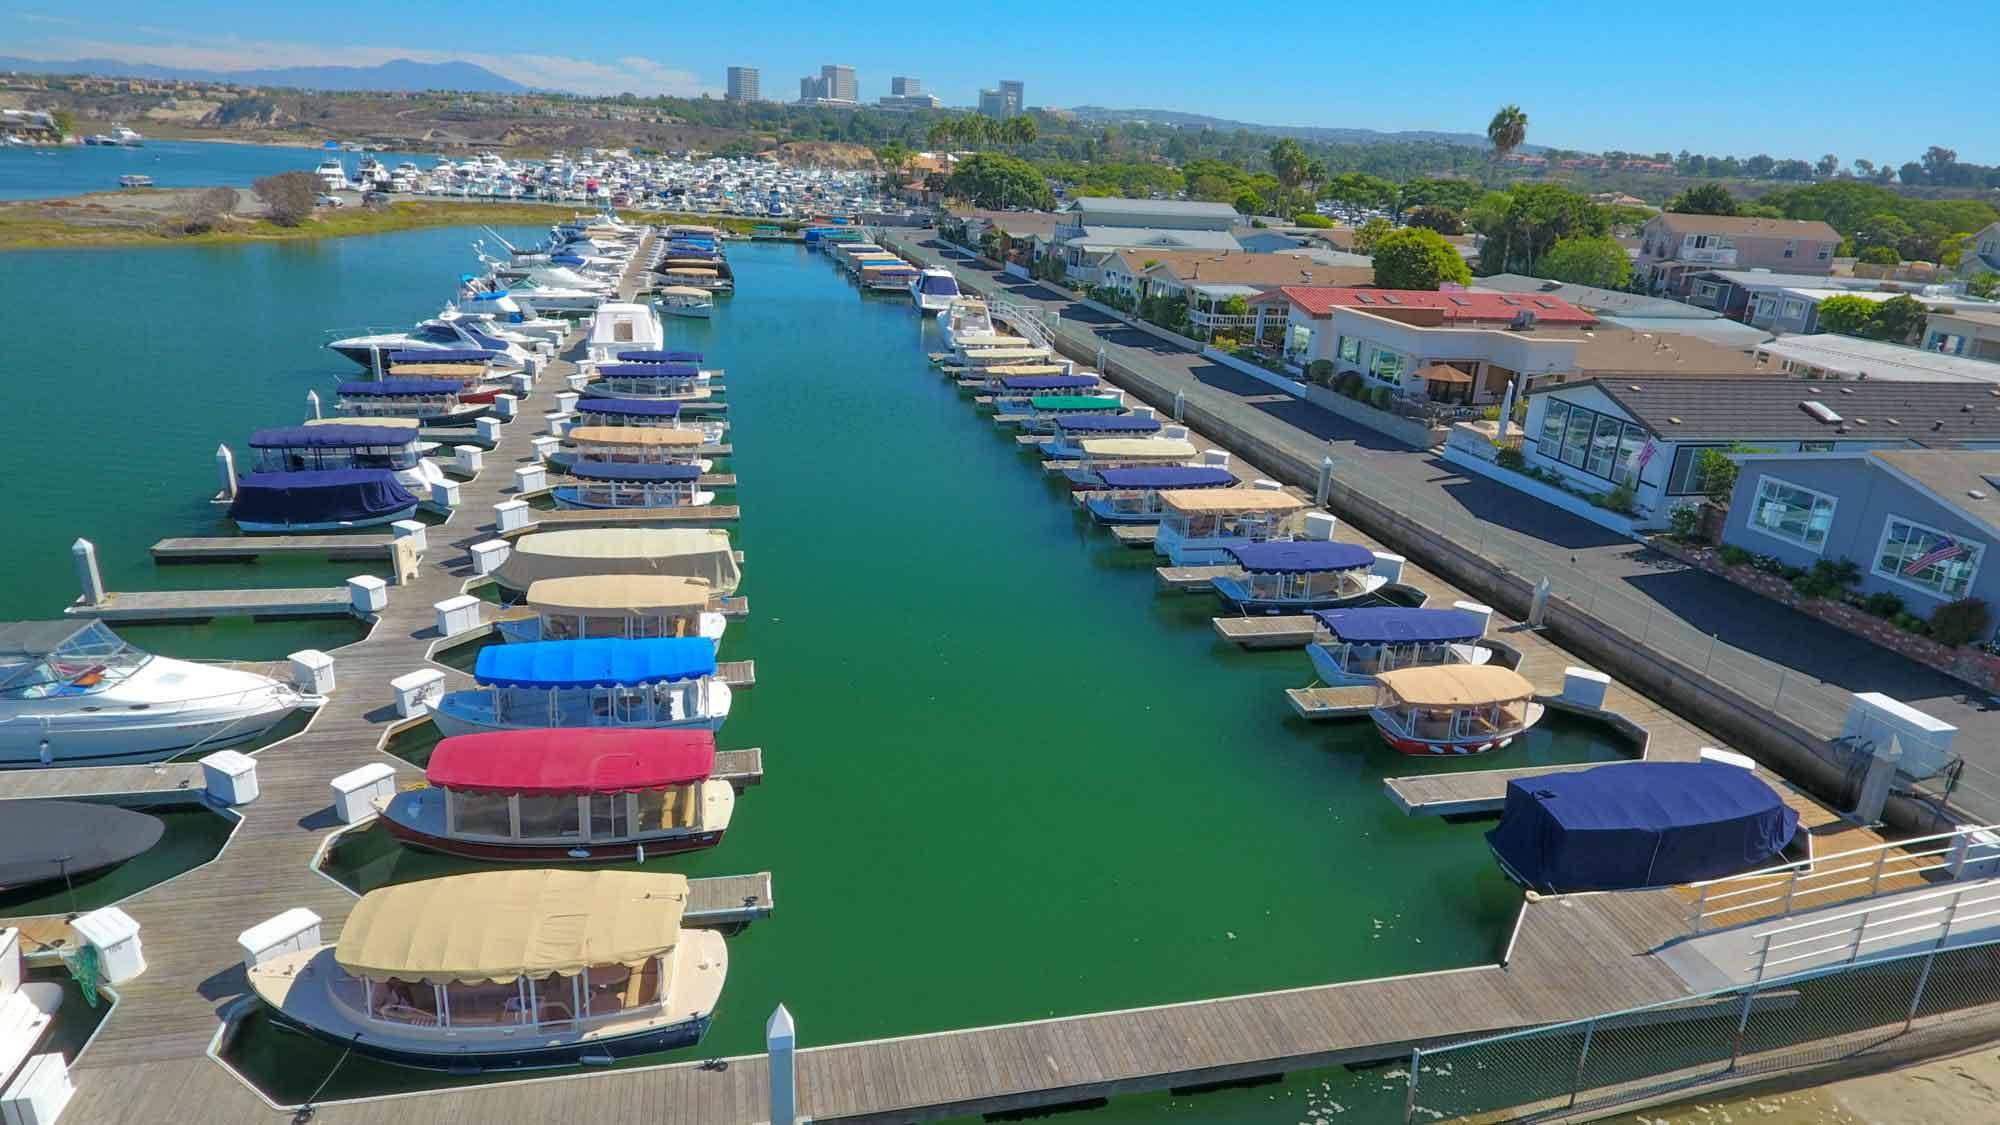 Duffy Boats rental